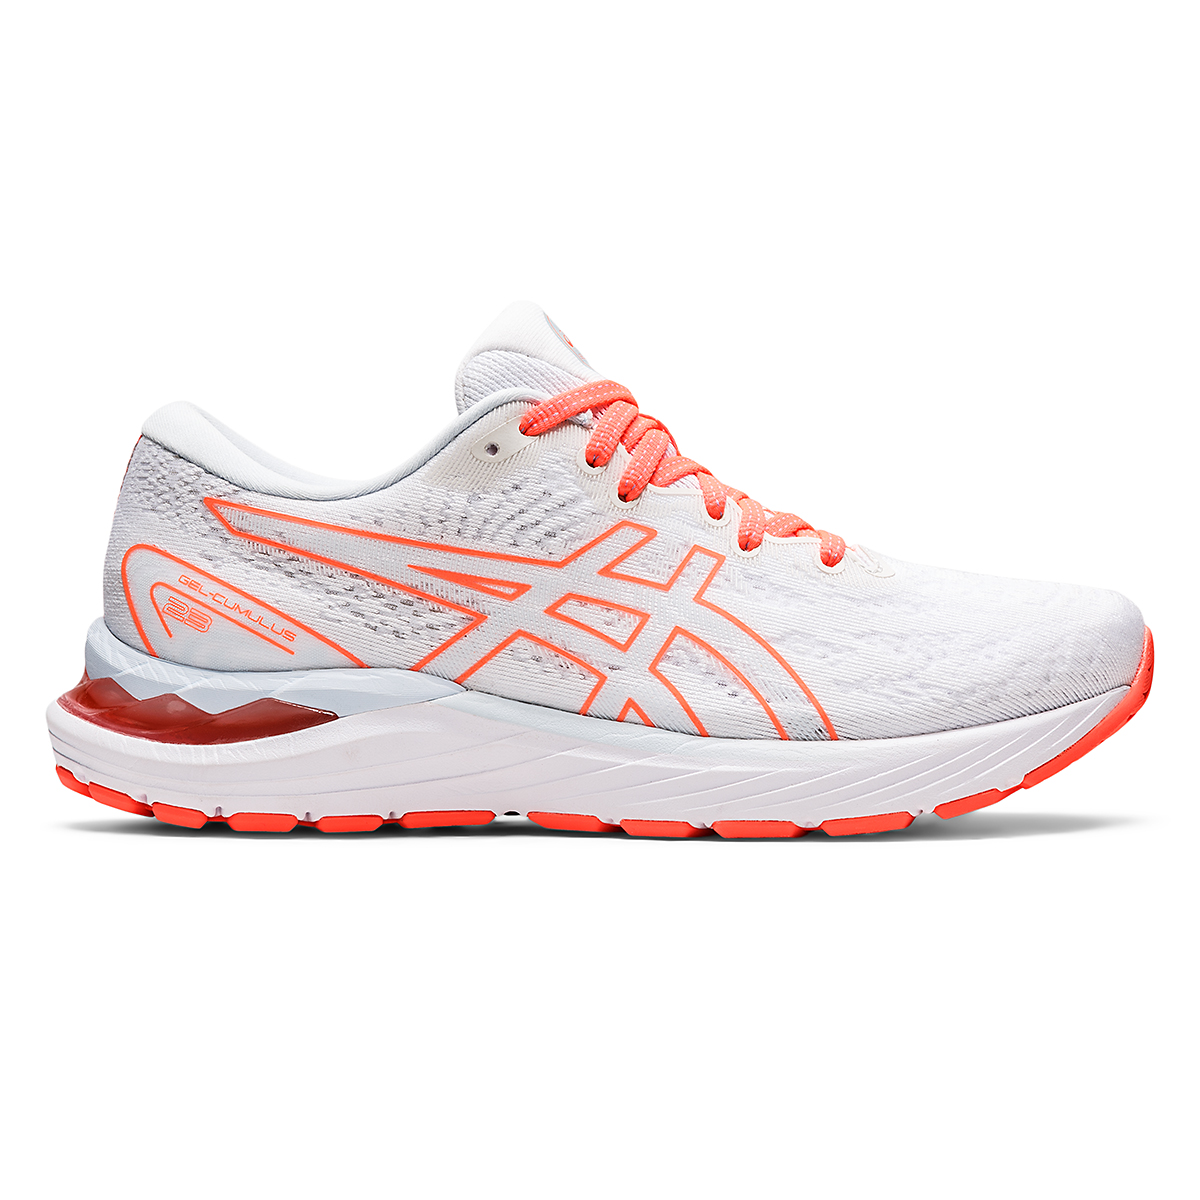 Women's Asics Gel-Cumulus 23 Running Shoe - Color: White/Sky - JackRabbit Exclusive - Size: 5 - Width: Regular, White/Sky - JackRabbit Exclusive, large, image 1